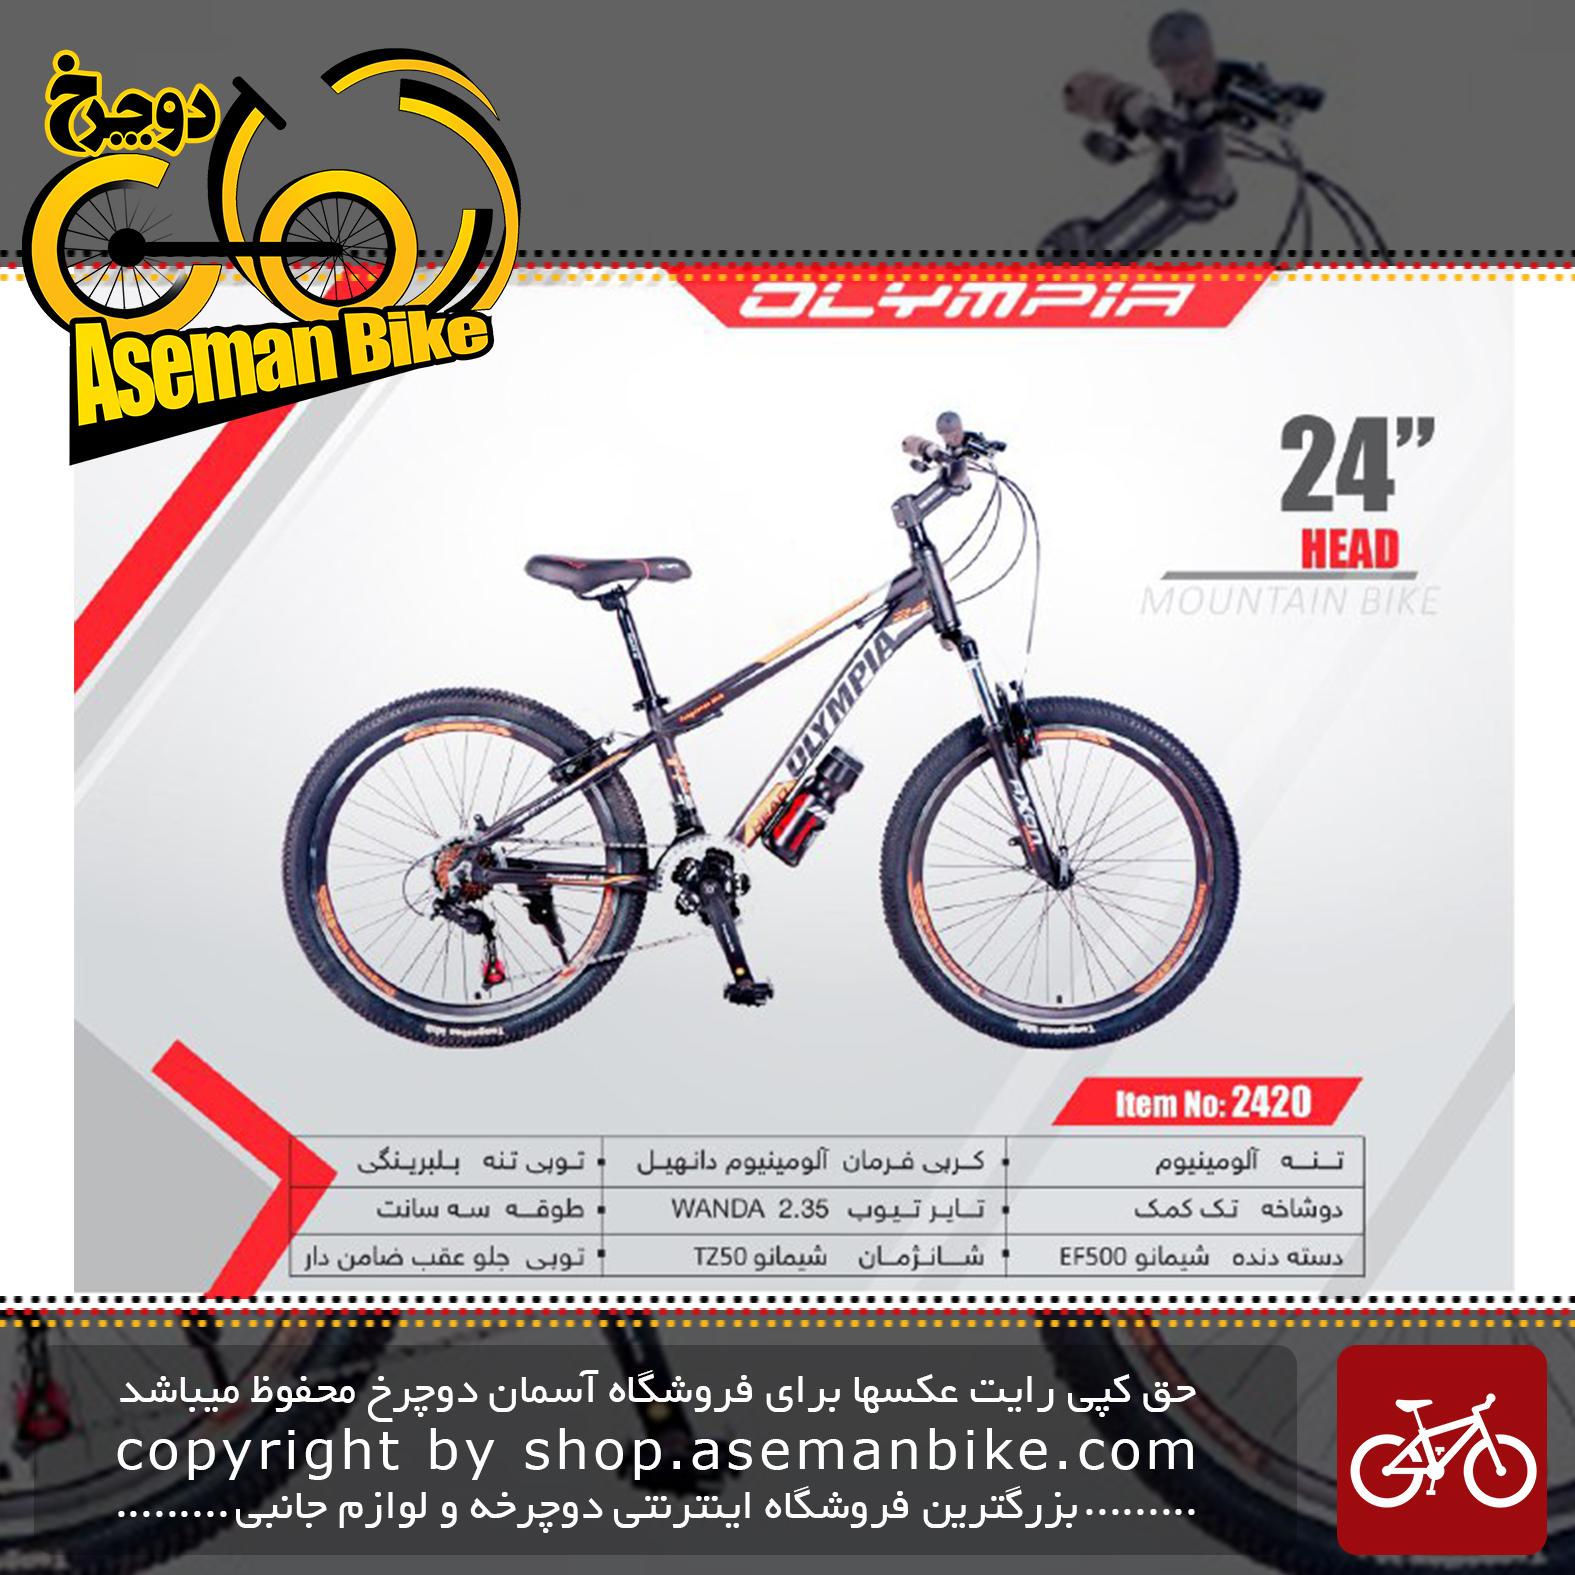 دوچرخه کوهستان المپیا سایز 24 مدل هد OLYMPIA SIZE 24 HEAD